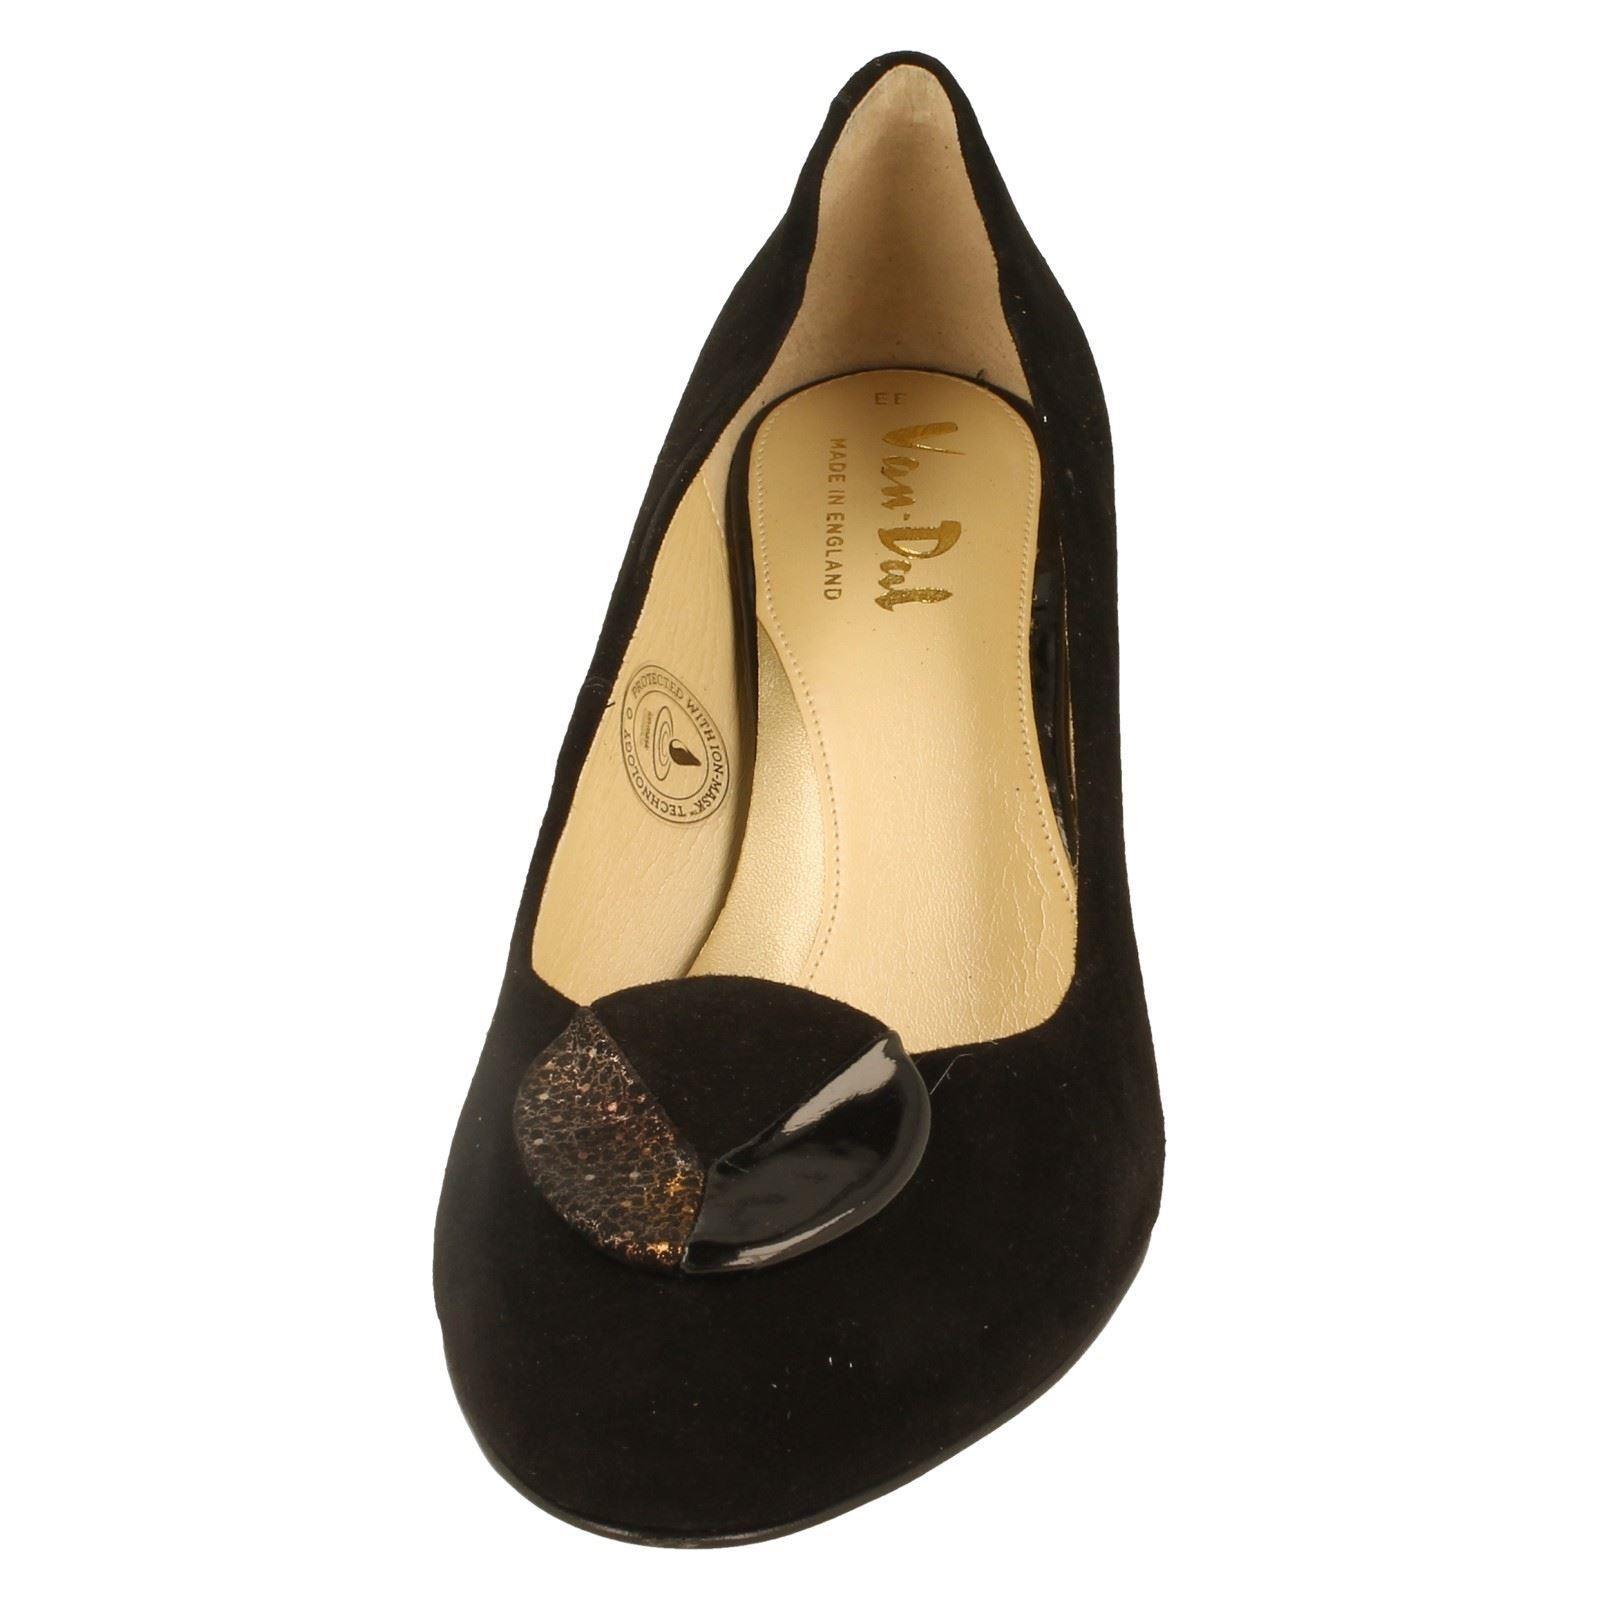 Hapton Ladies Style Dal Black The Shoes Van w Suede Court rxqAx7YB